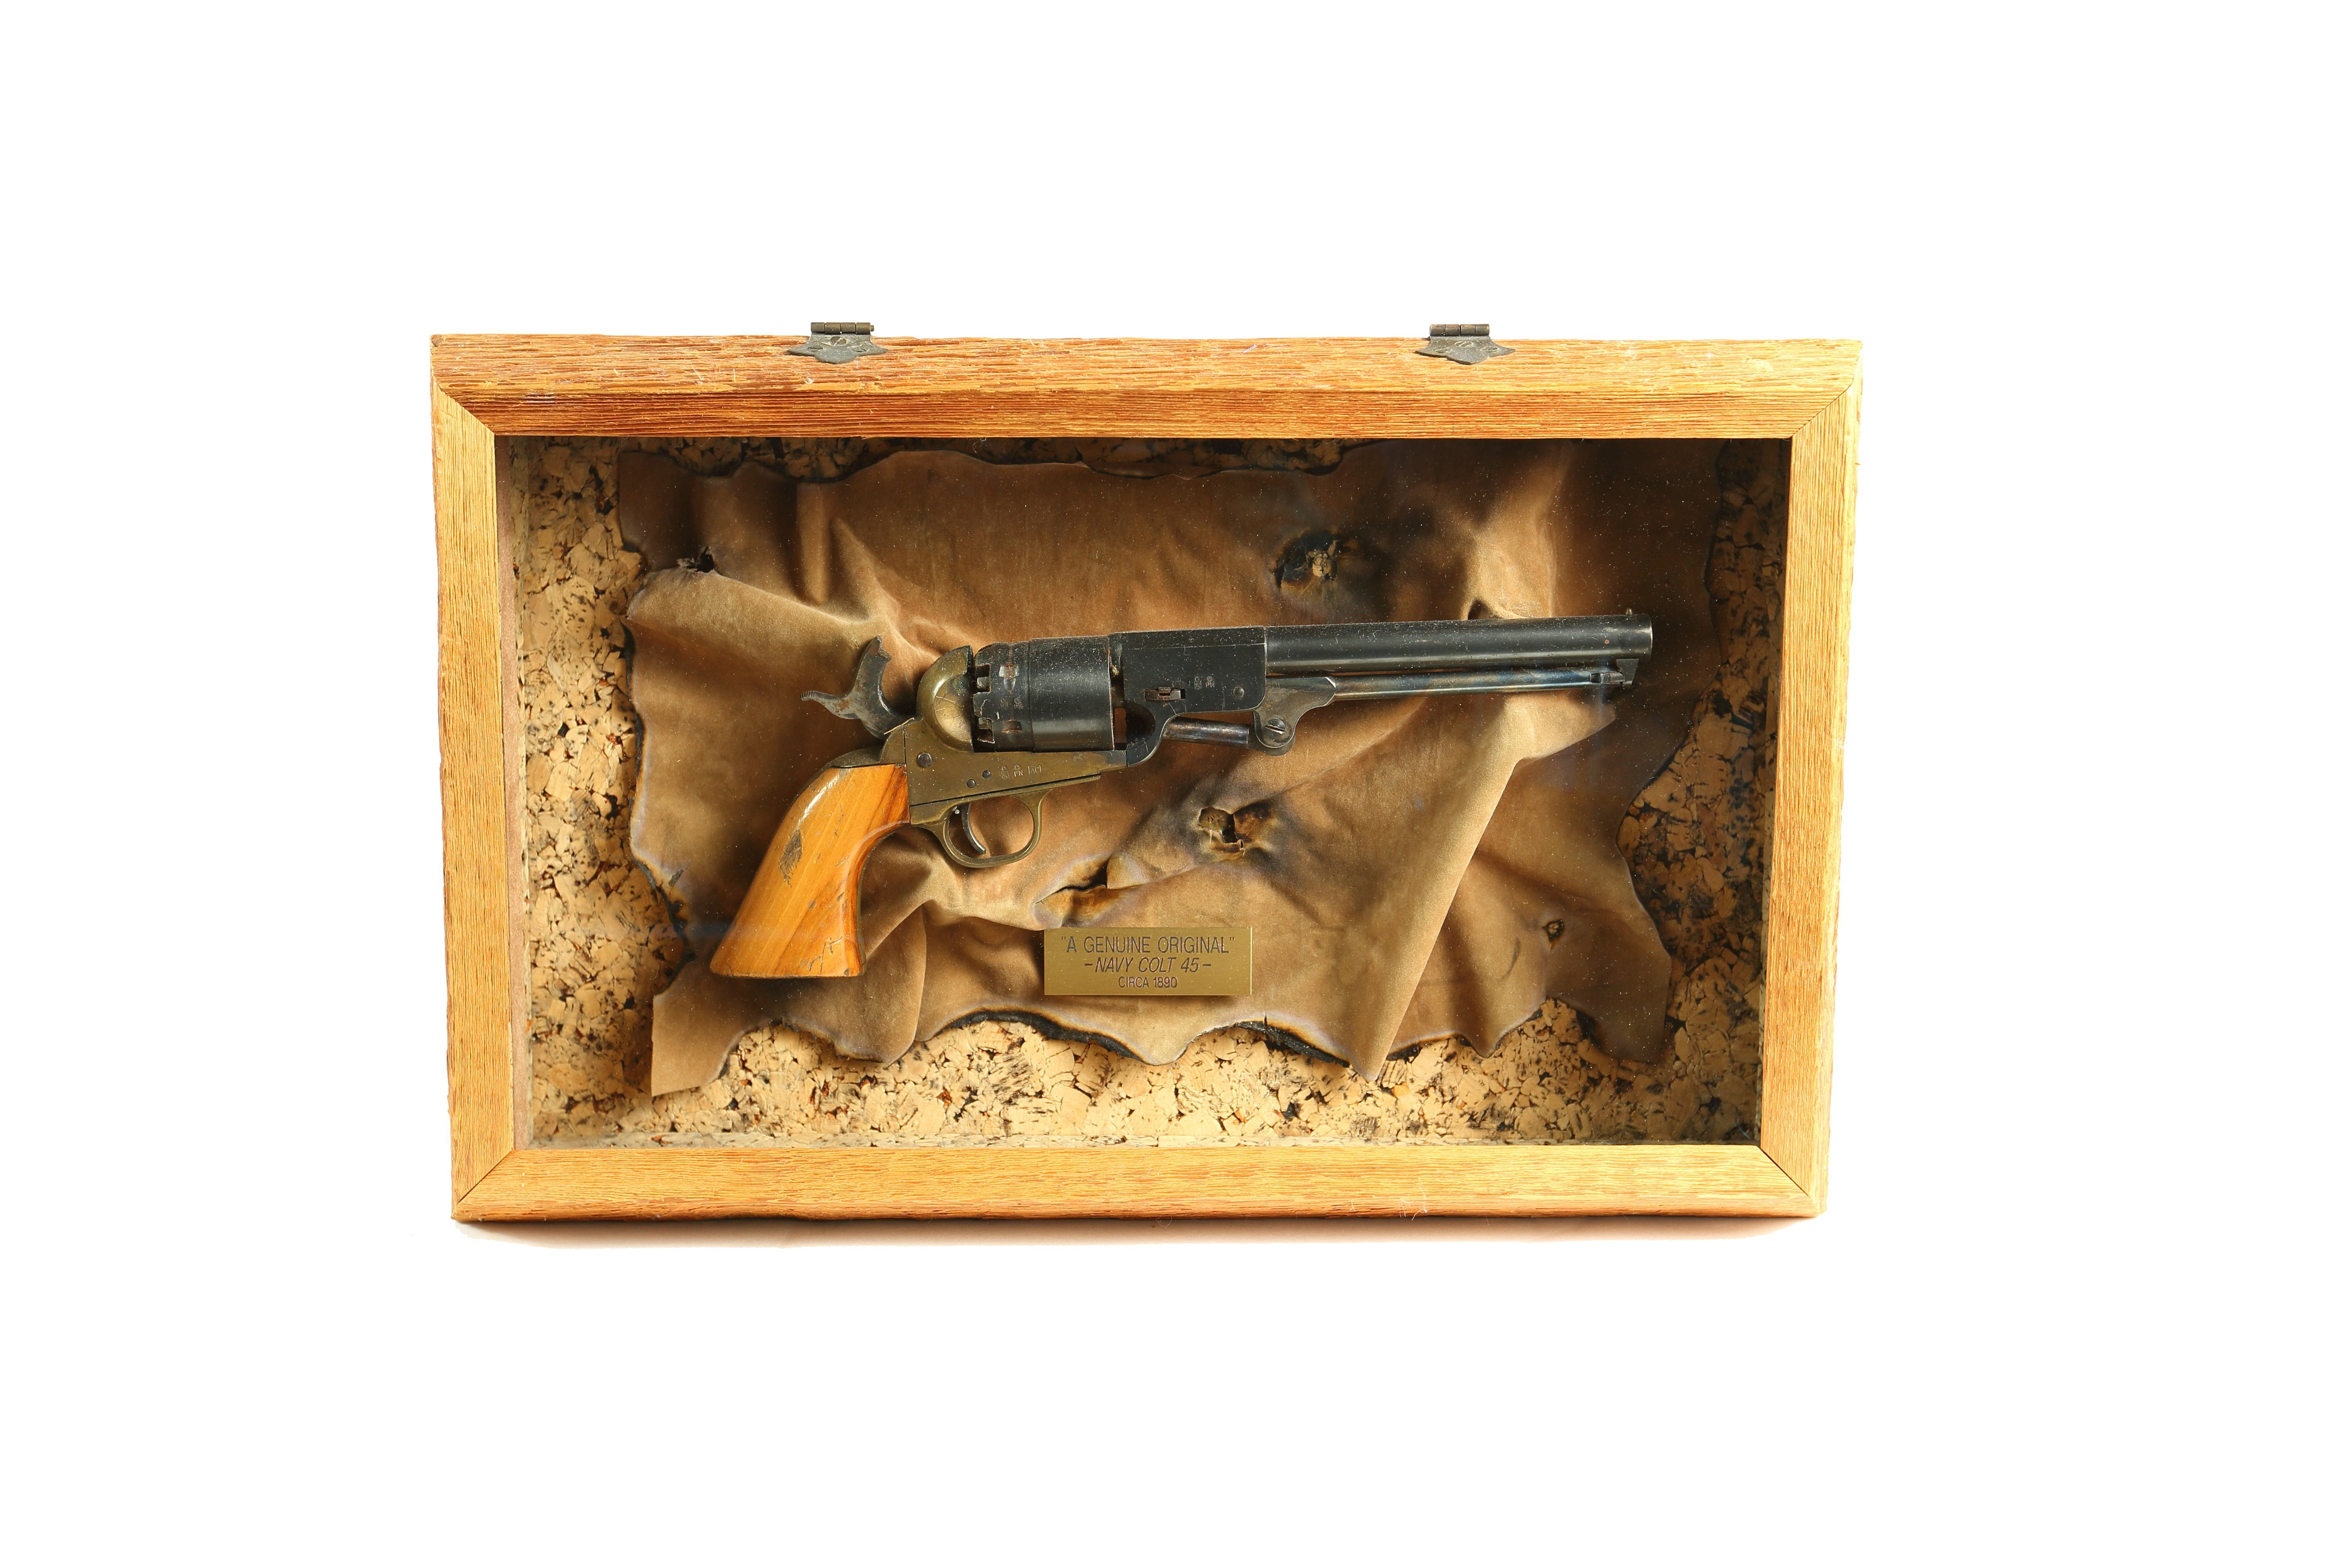 gun in custom shadow boxes - Houston, TX